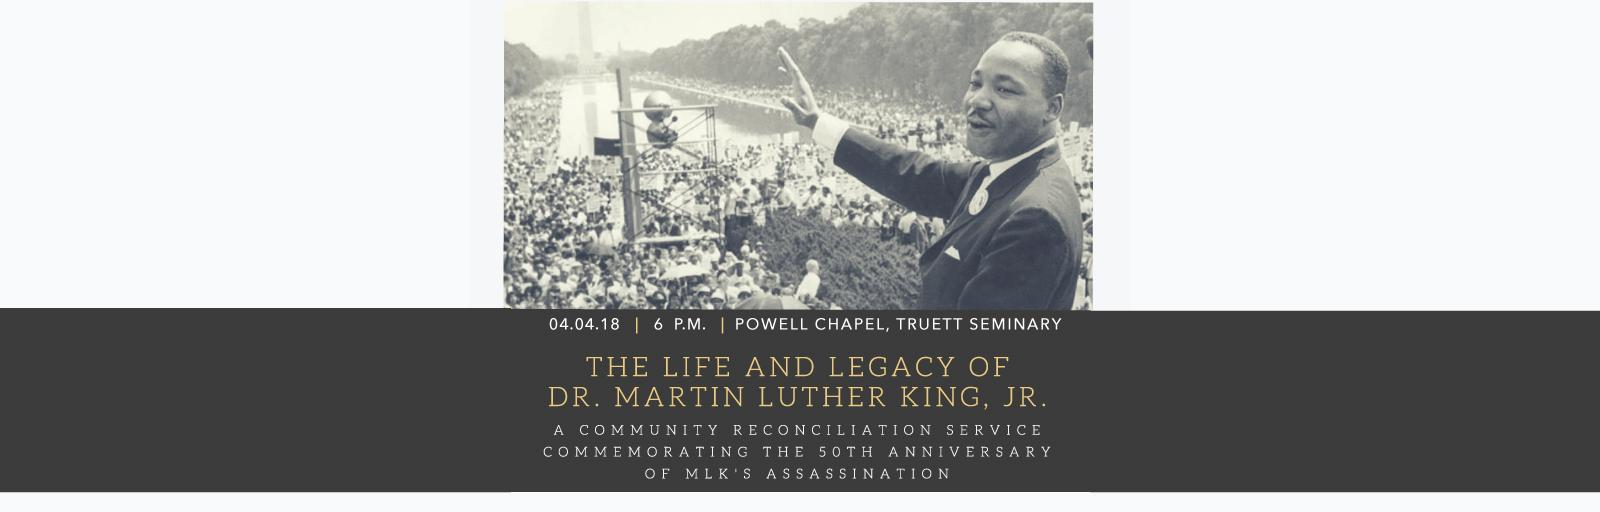 MLK_Reconciliation_Event